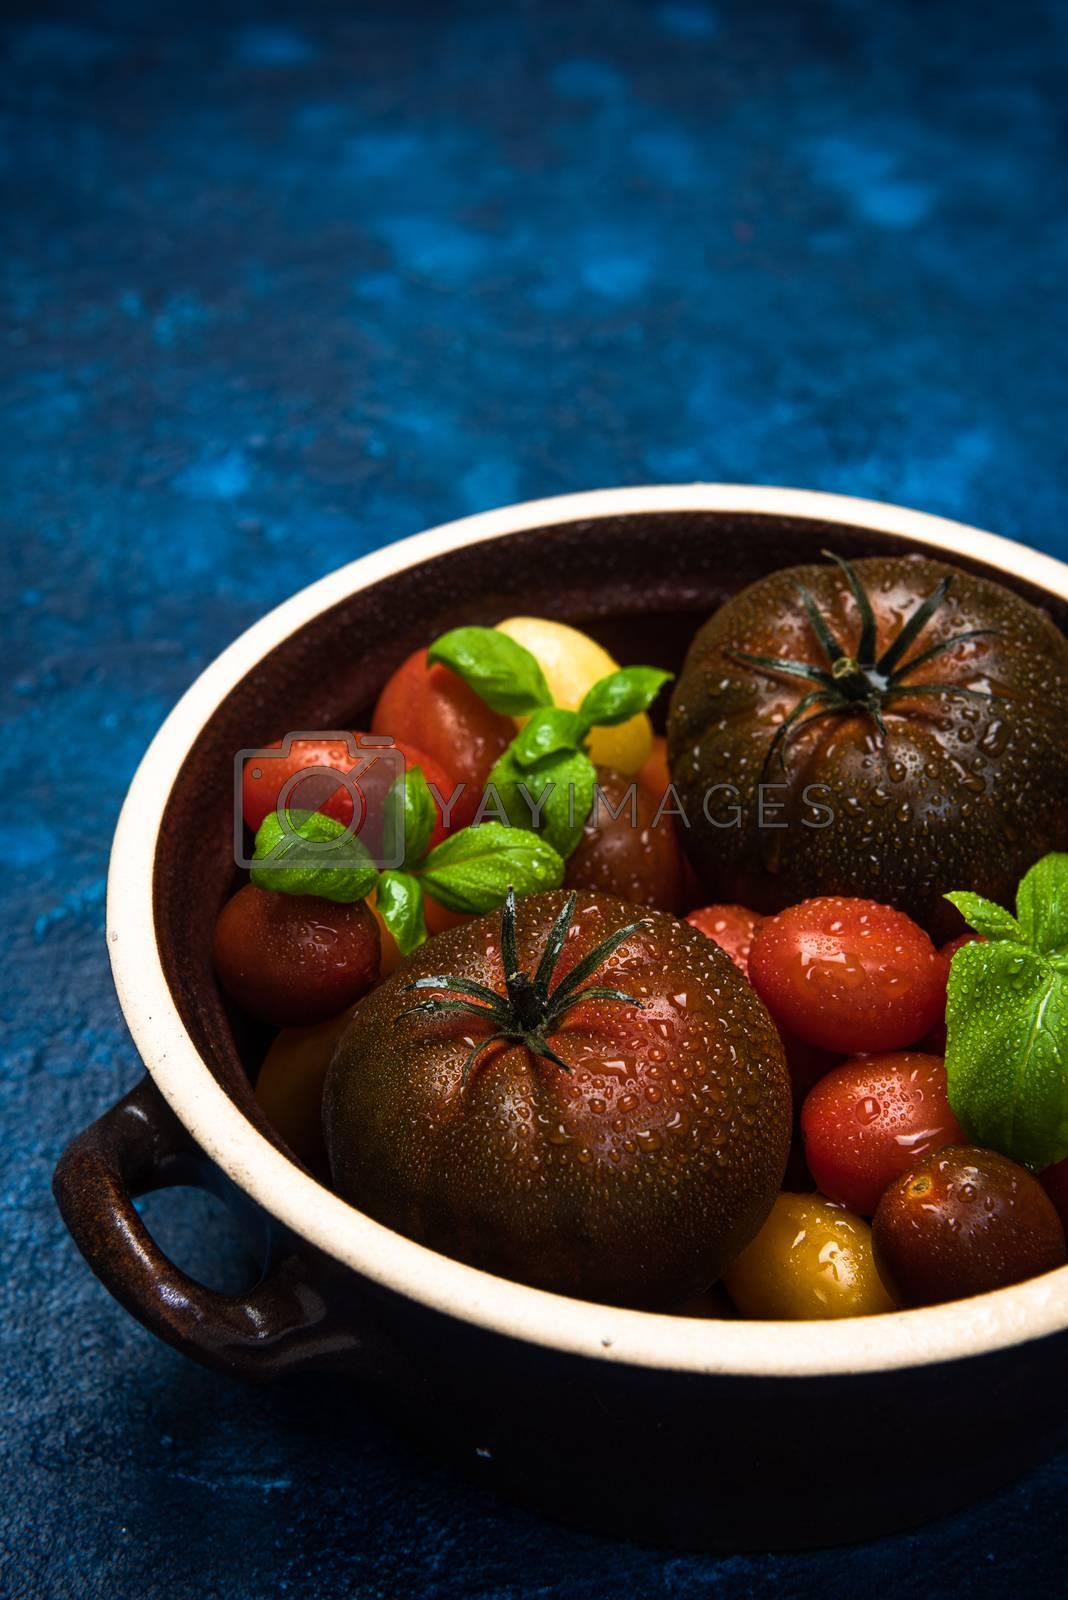 Market Fresh Organic Tomatoes on Concrete Kitchen Table Top.